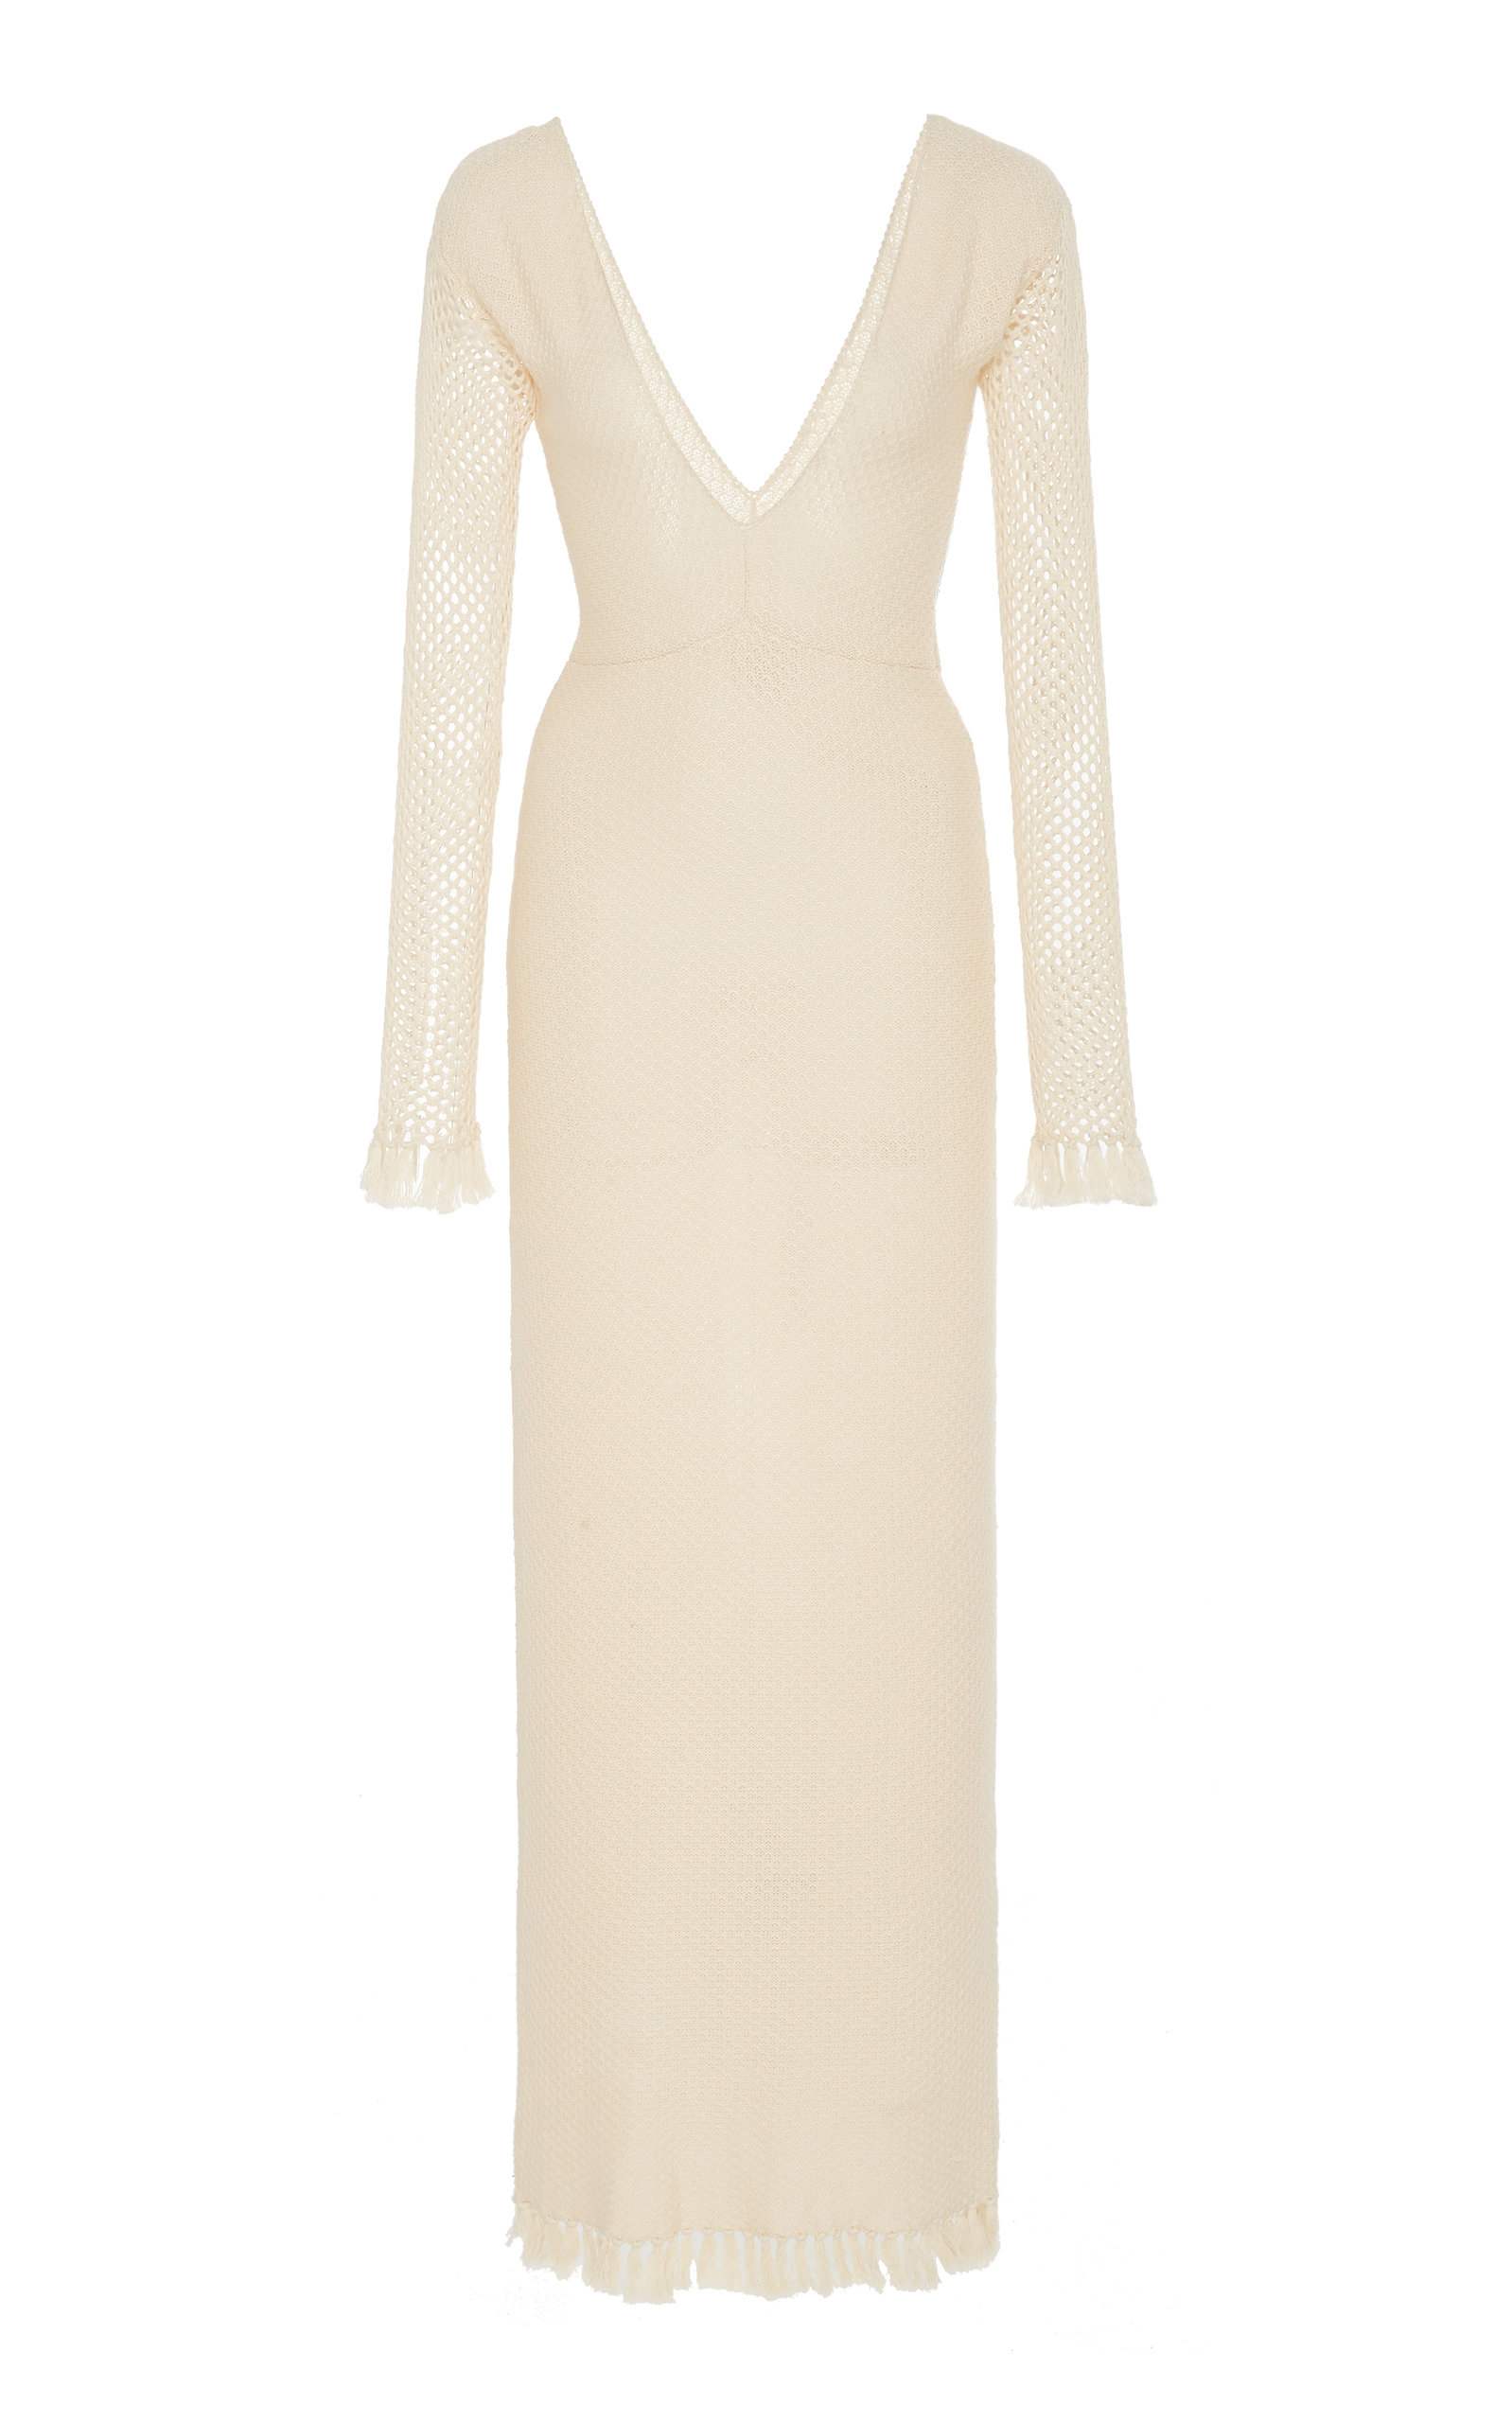 Buy Escvdo Palma Sheer Long Sleeve Knit Midi Dress online, shop Escvdo at the best price